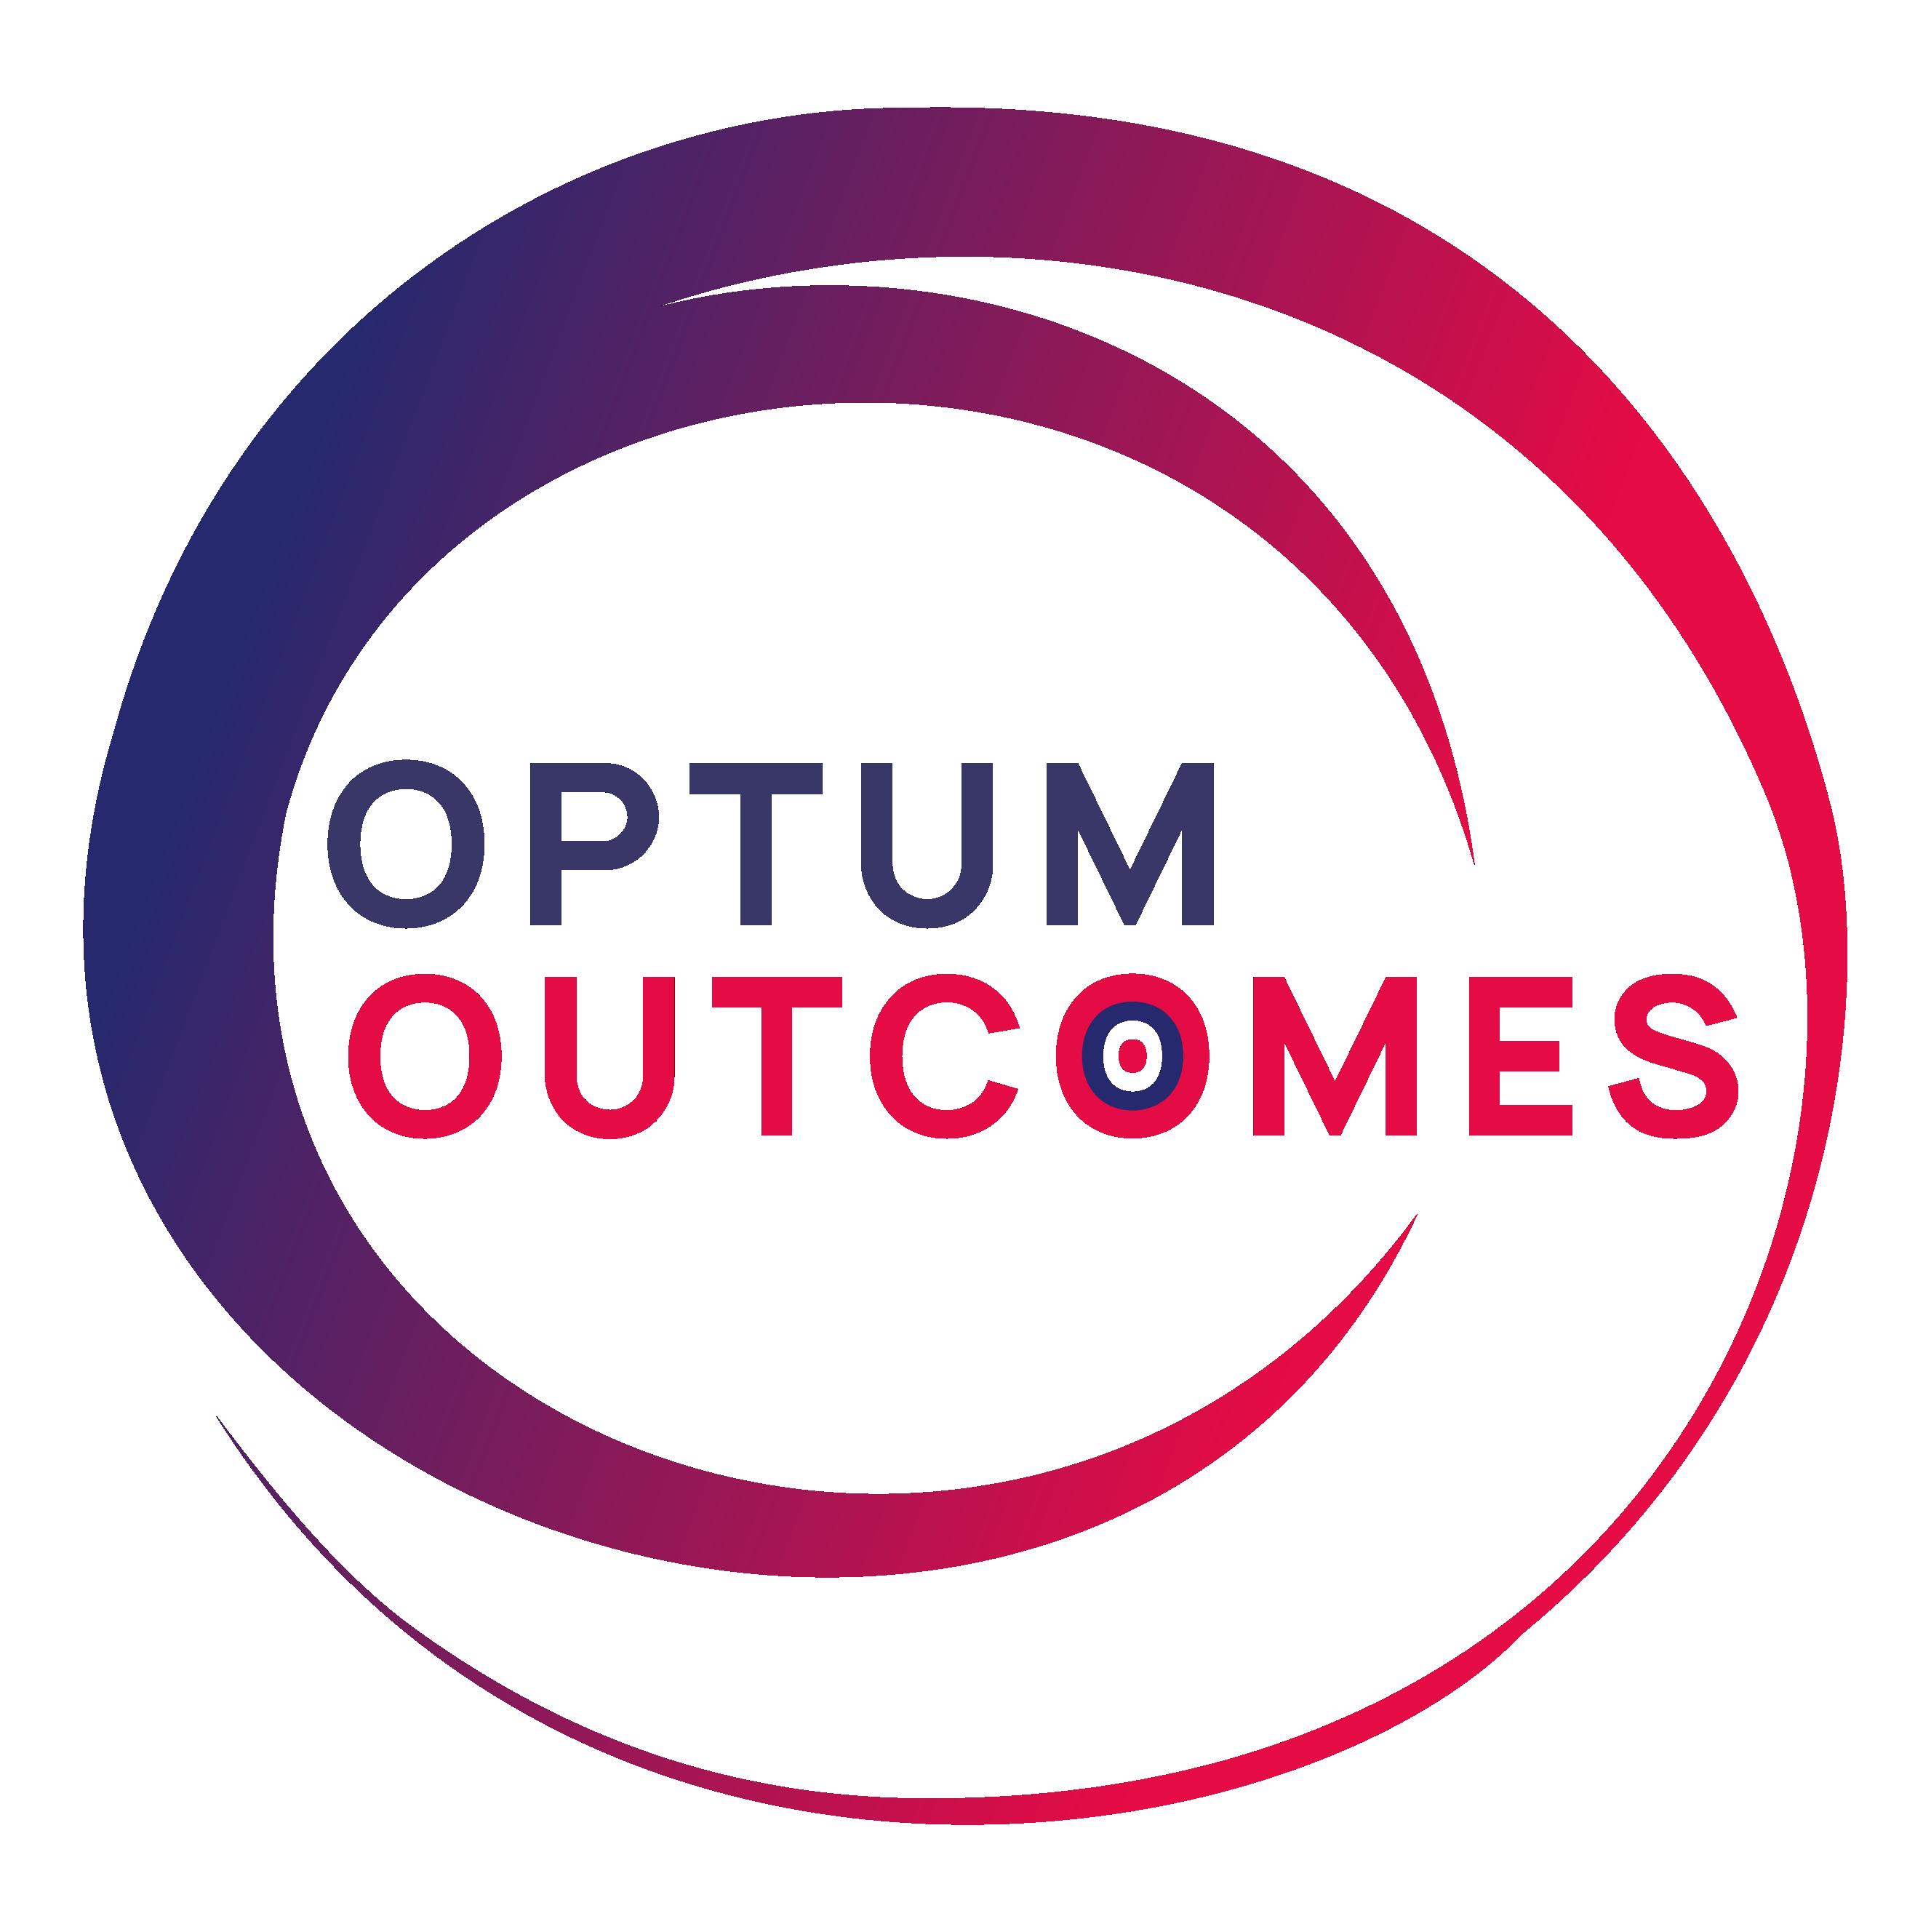 Optum Outcomes